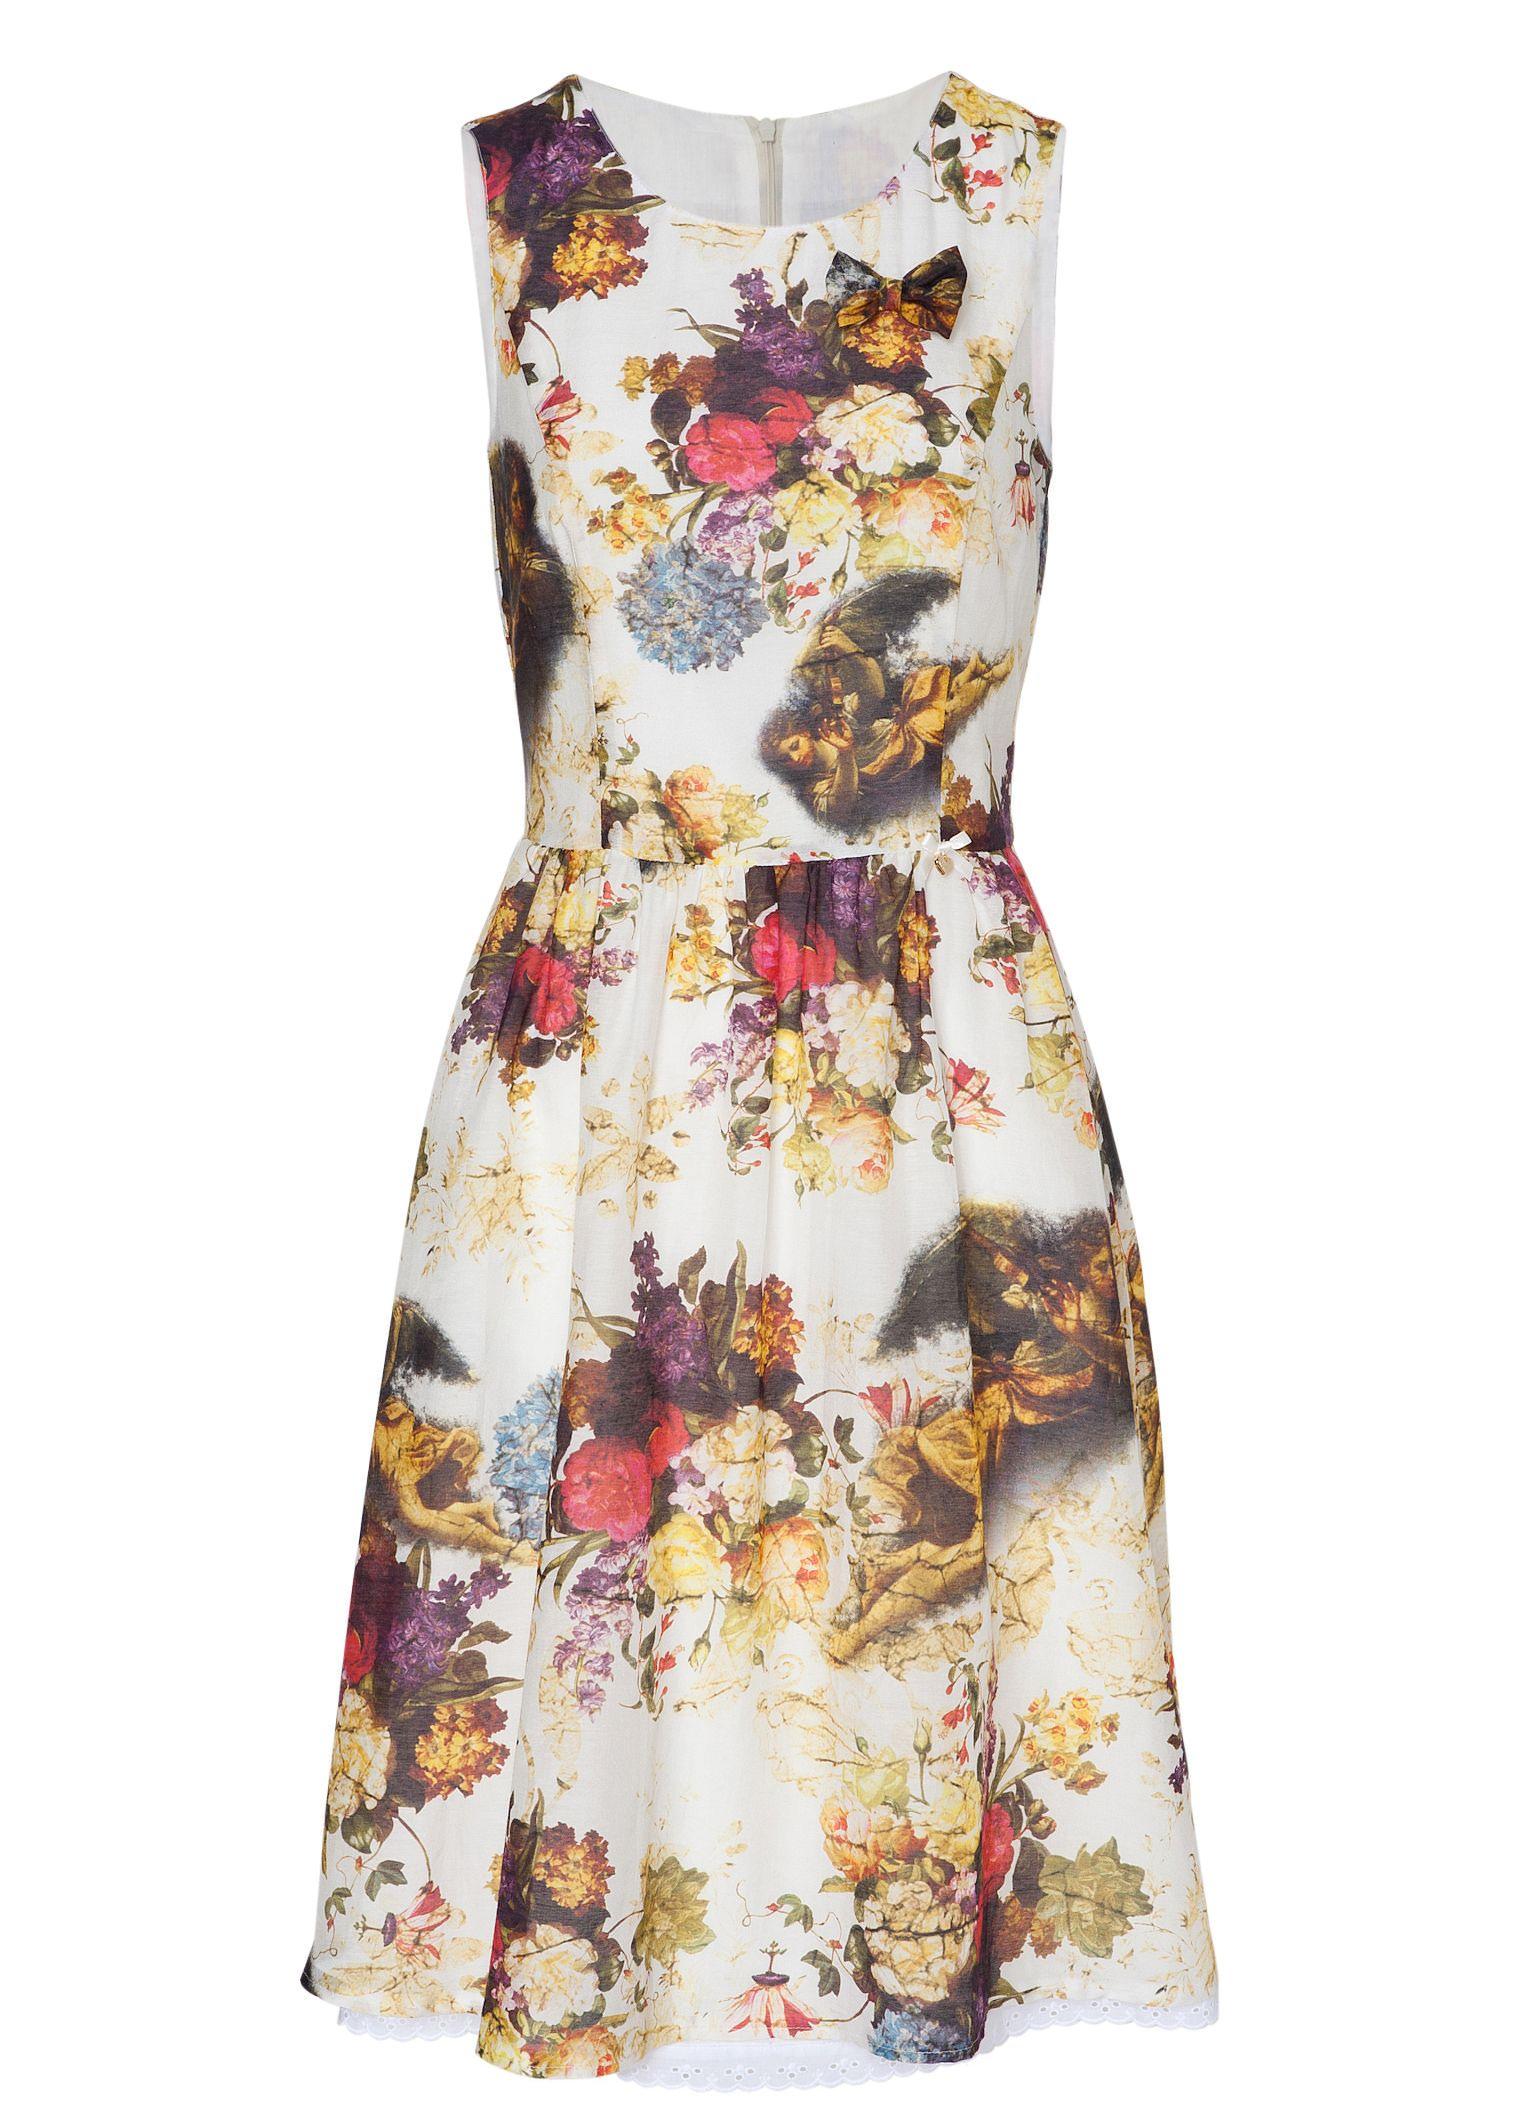 Lola Paltinger   Women s Fashion   Couture Kleid    HSE24  clothing   accessoires  dress  shopping f77e7670bb